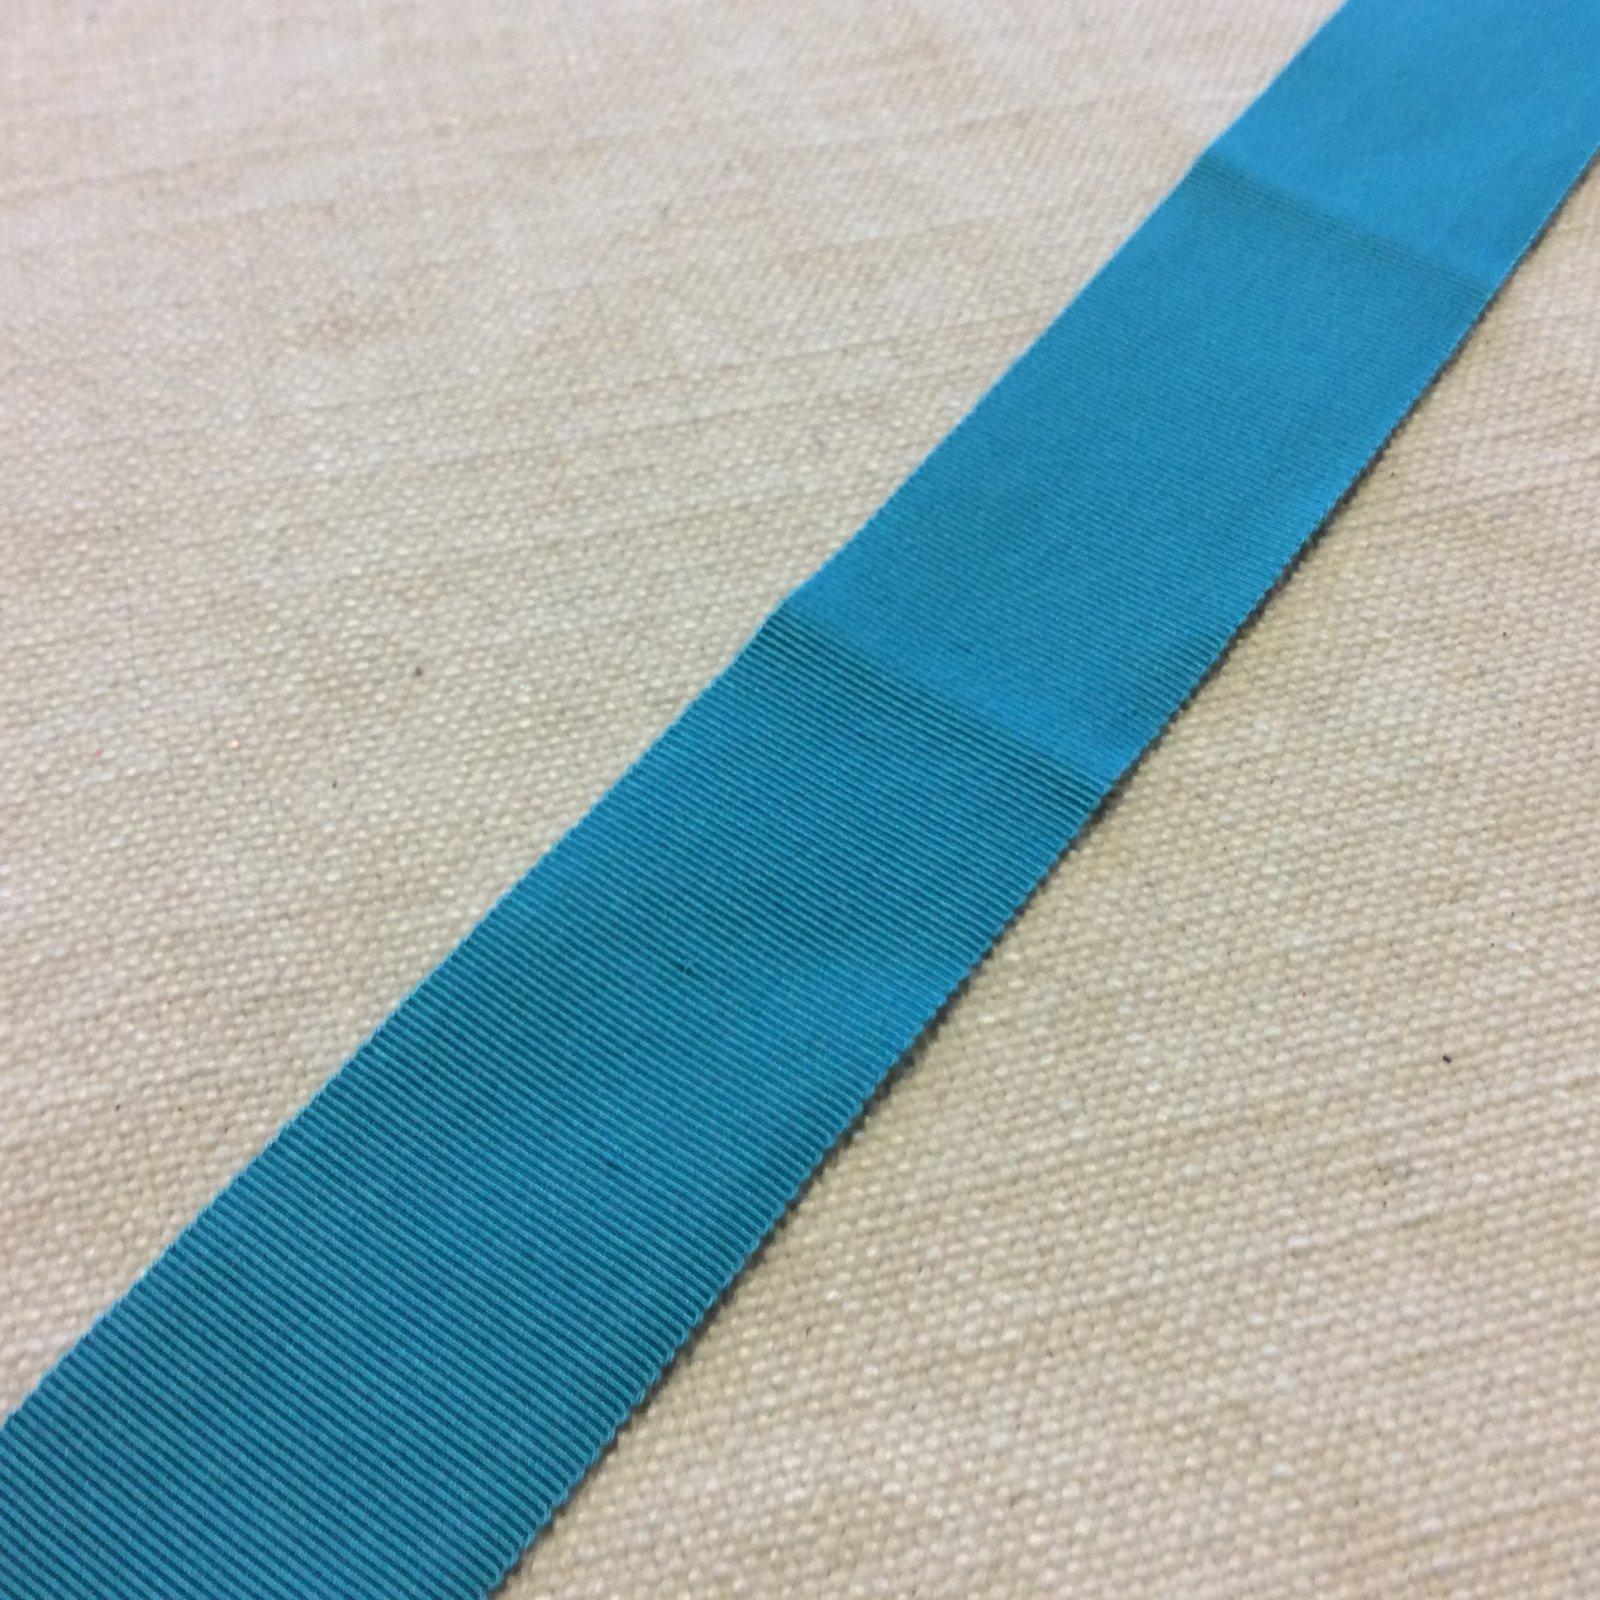 Grosgrain Ribbon 1.5 High End Japanese Woven Turquoise Blue Trim Ribbon RIB1175